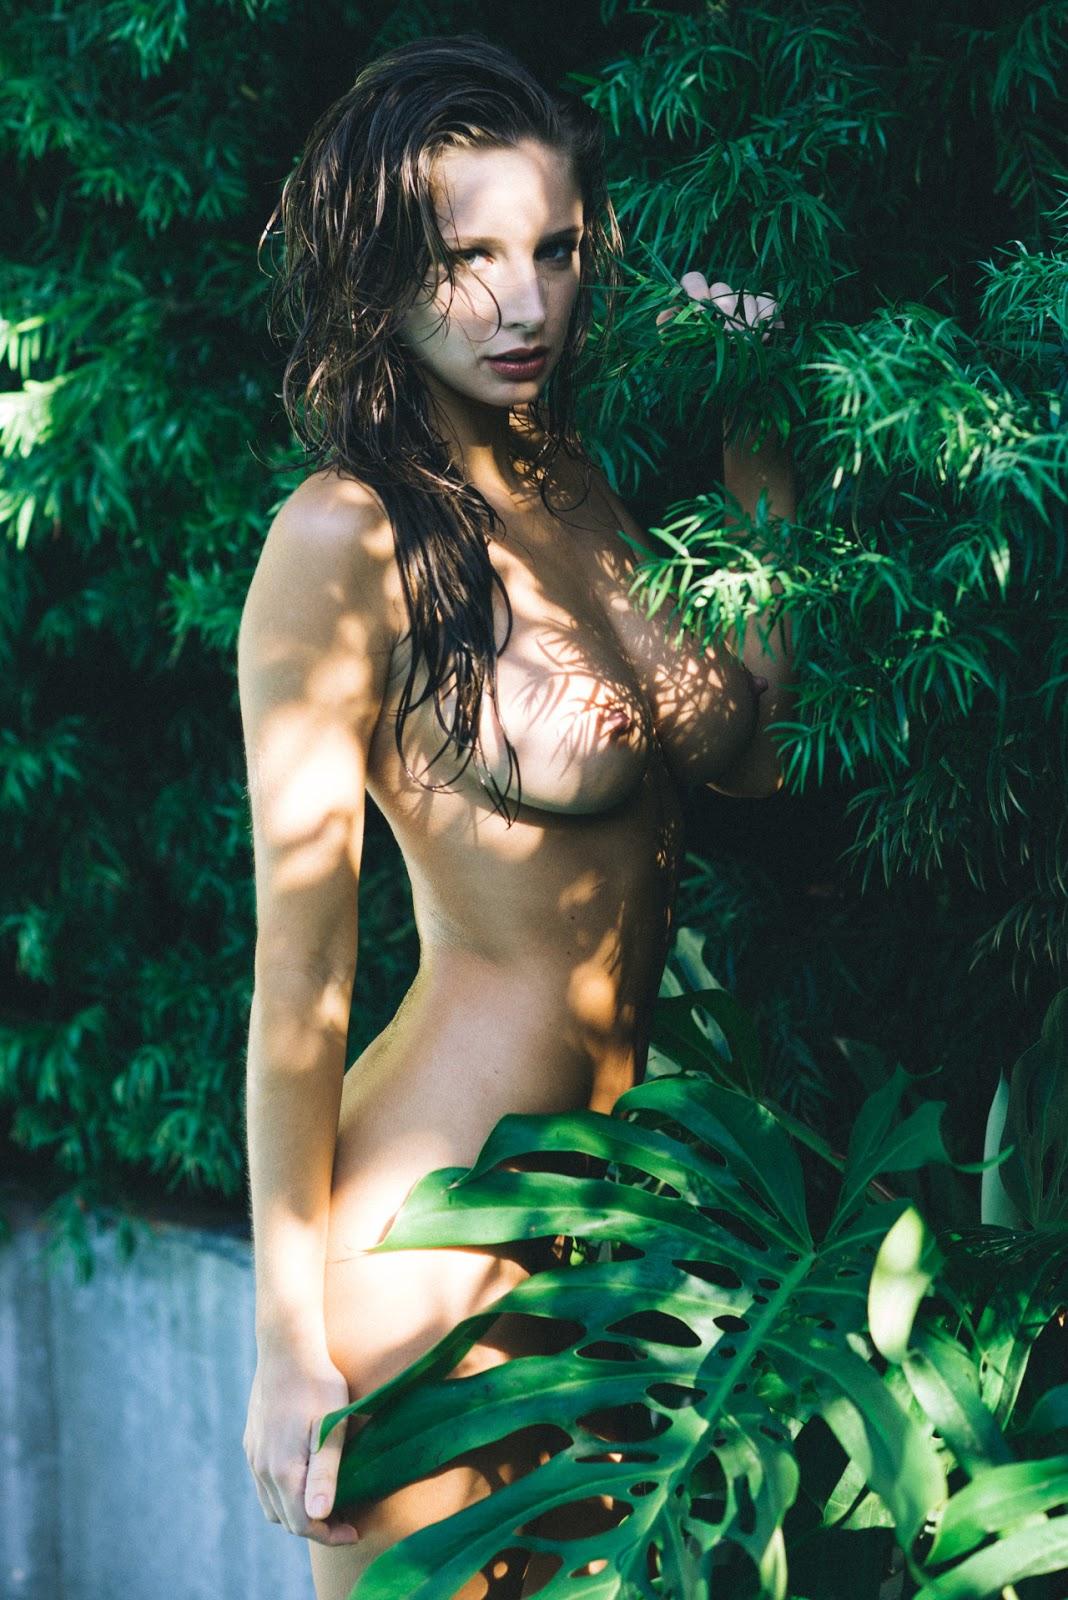 emily shaw nude